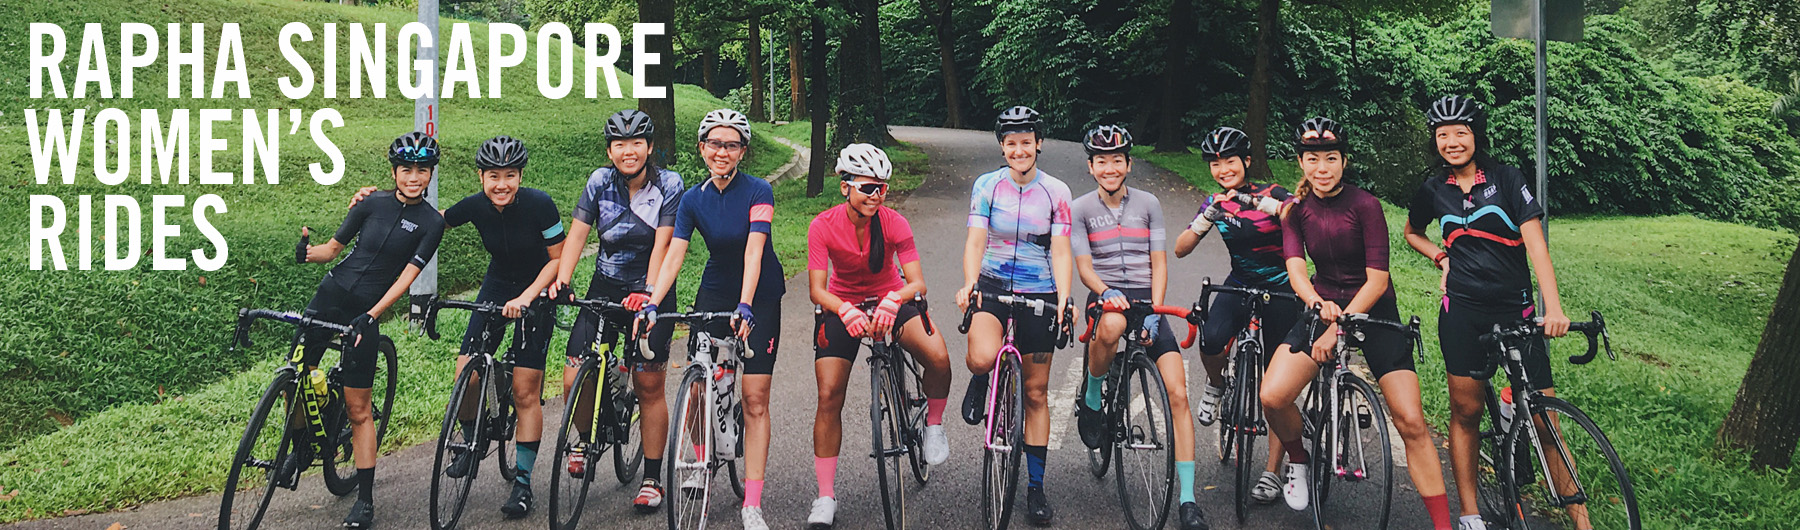 Rapha Singapore Monthly Women's Ride | 7.00am, 21 Jan 2018 | Macritchie Reservoir Drop Off